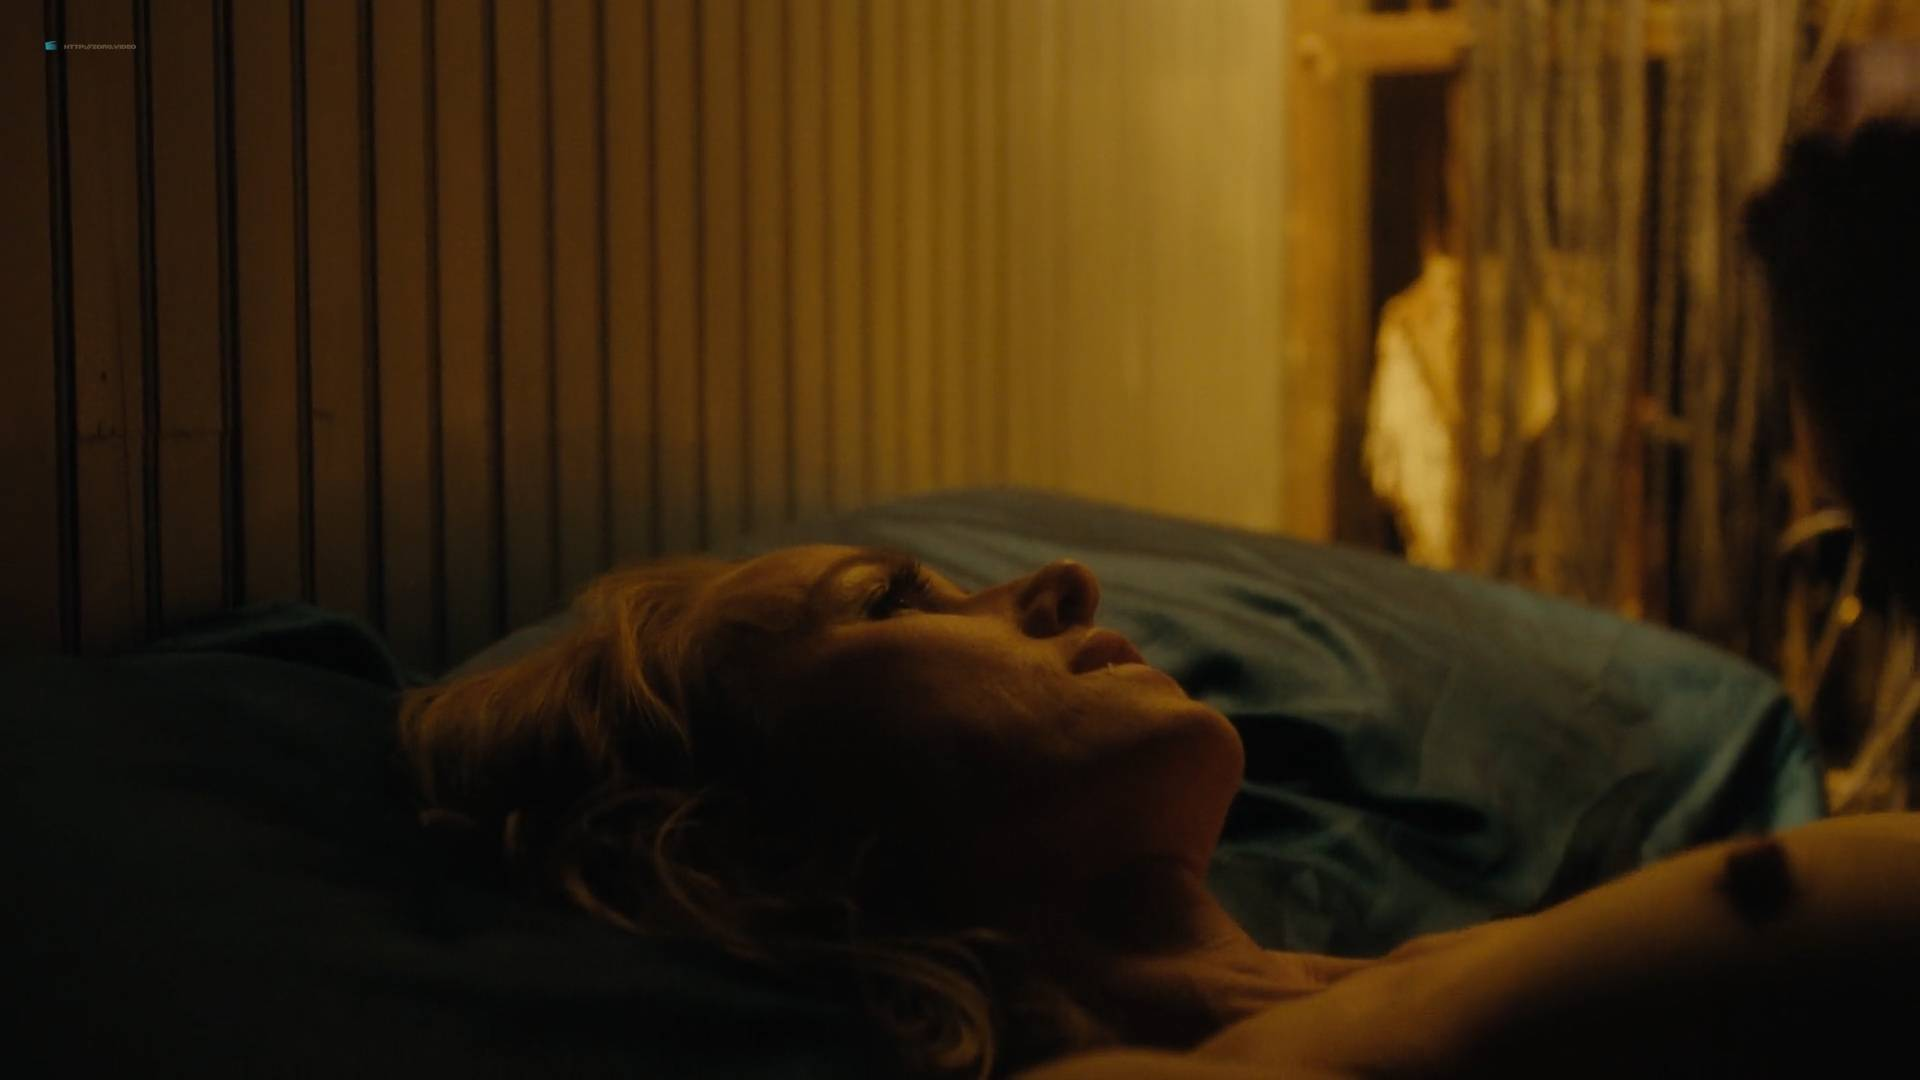 Anja Ali Samantha Lesbian Porn naomi watts nude sex sophie cookson nude topless and lesbian